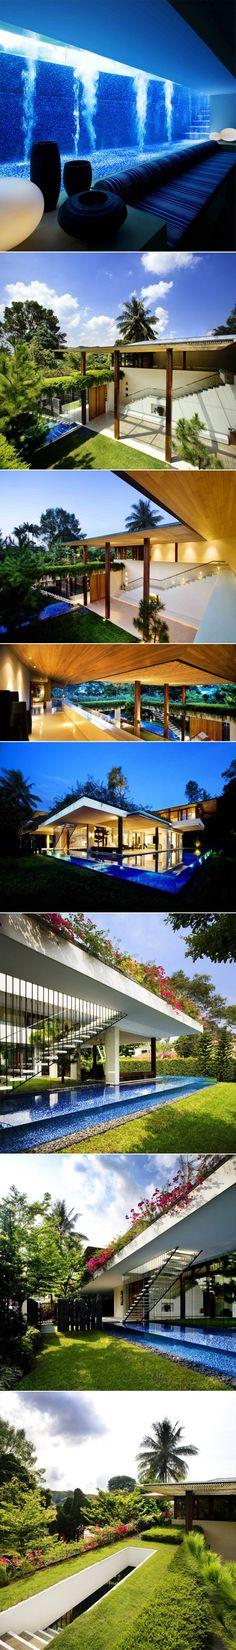 Tangga House by Guz Architects. Singapore